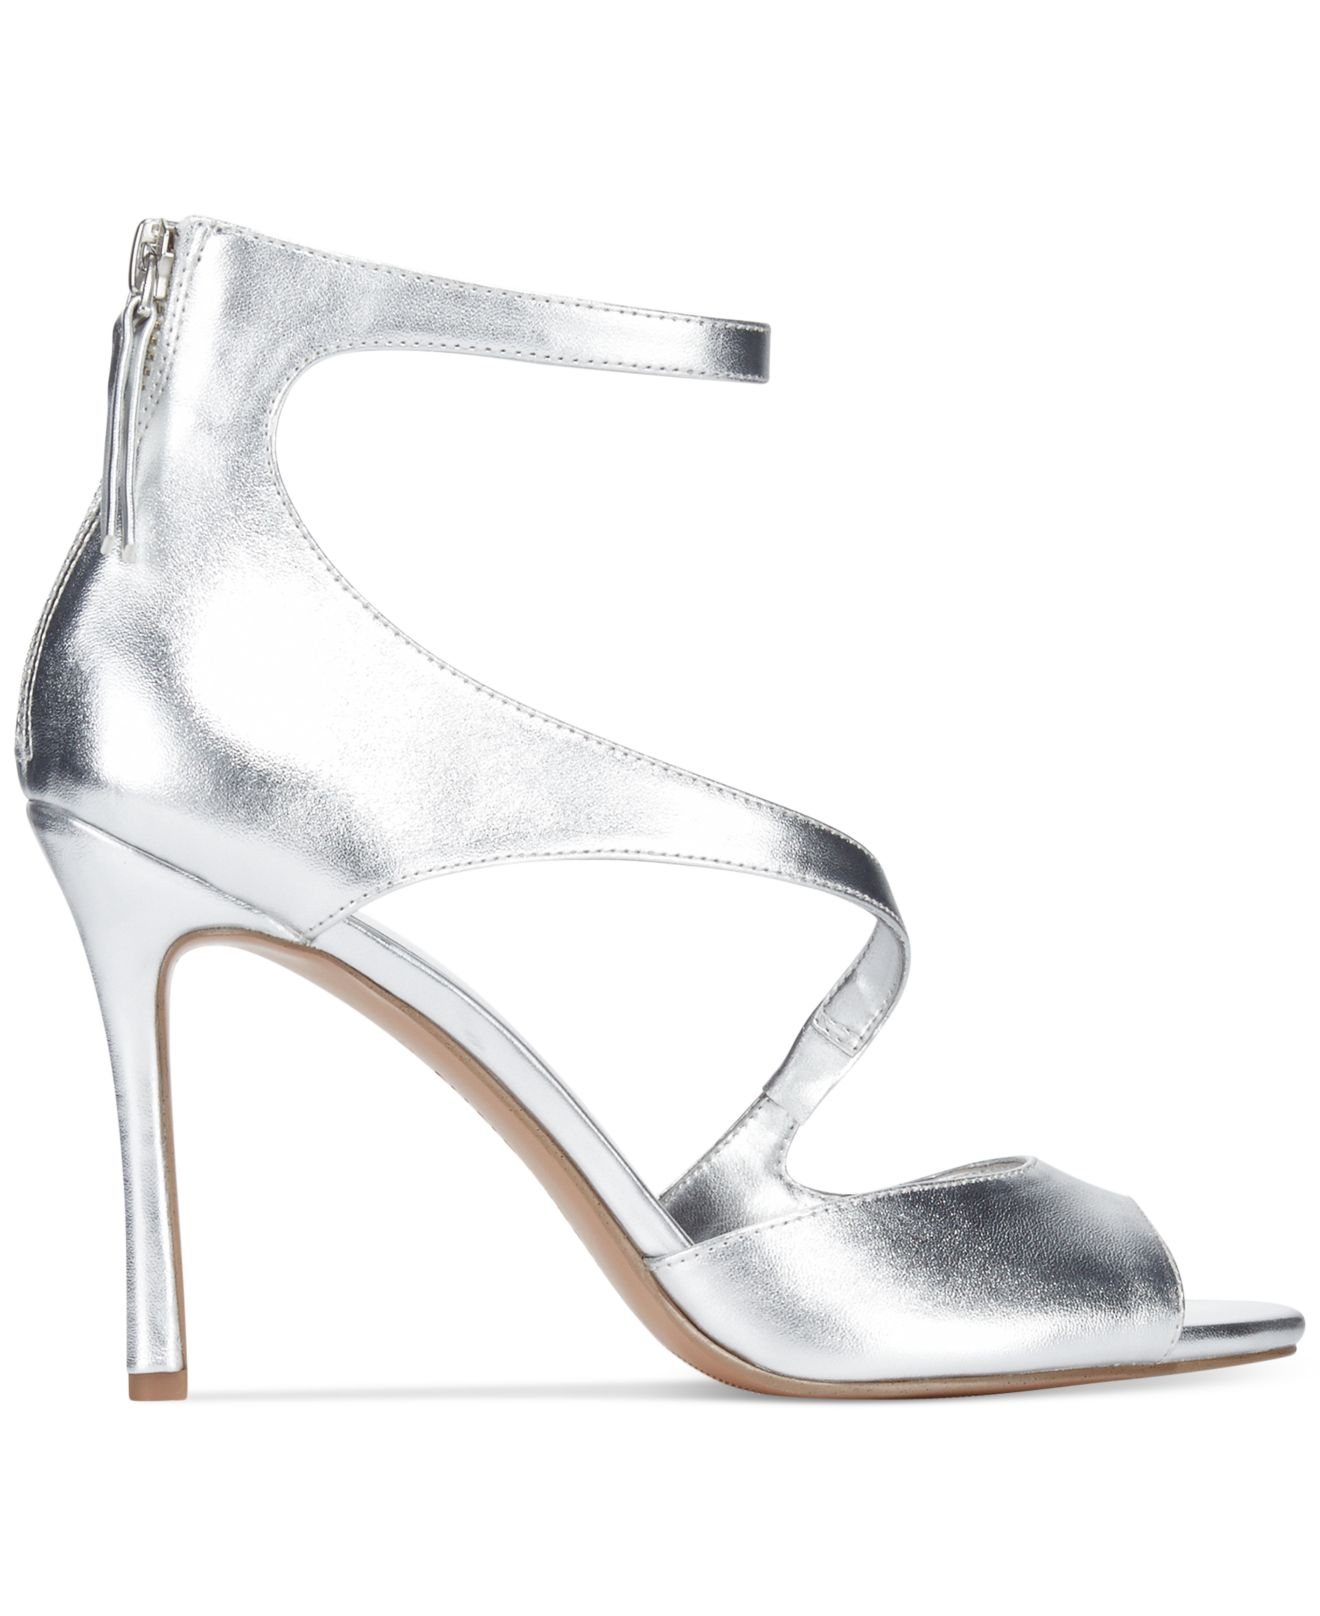 6d193e0378c Lyst - Nine West Festivitie High Heel Evening Sandals in Metallic